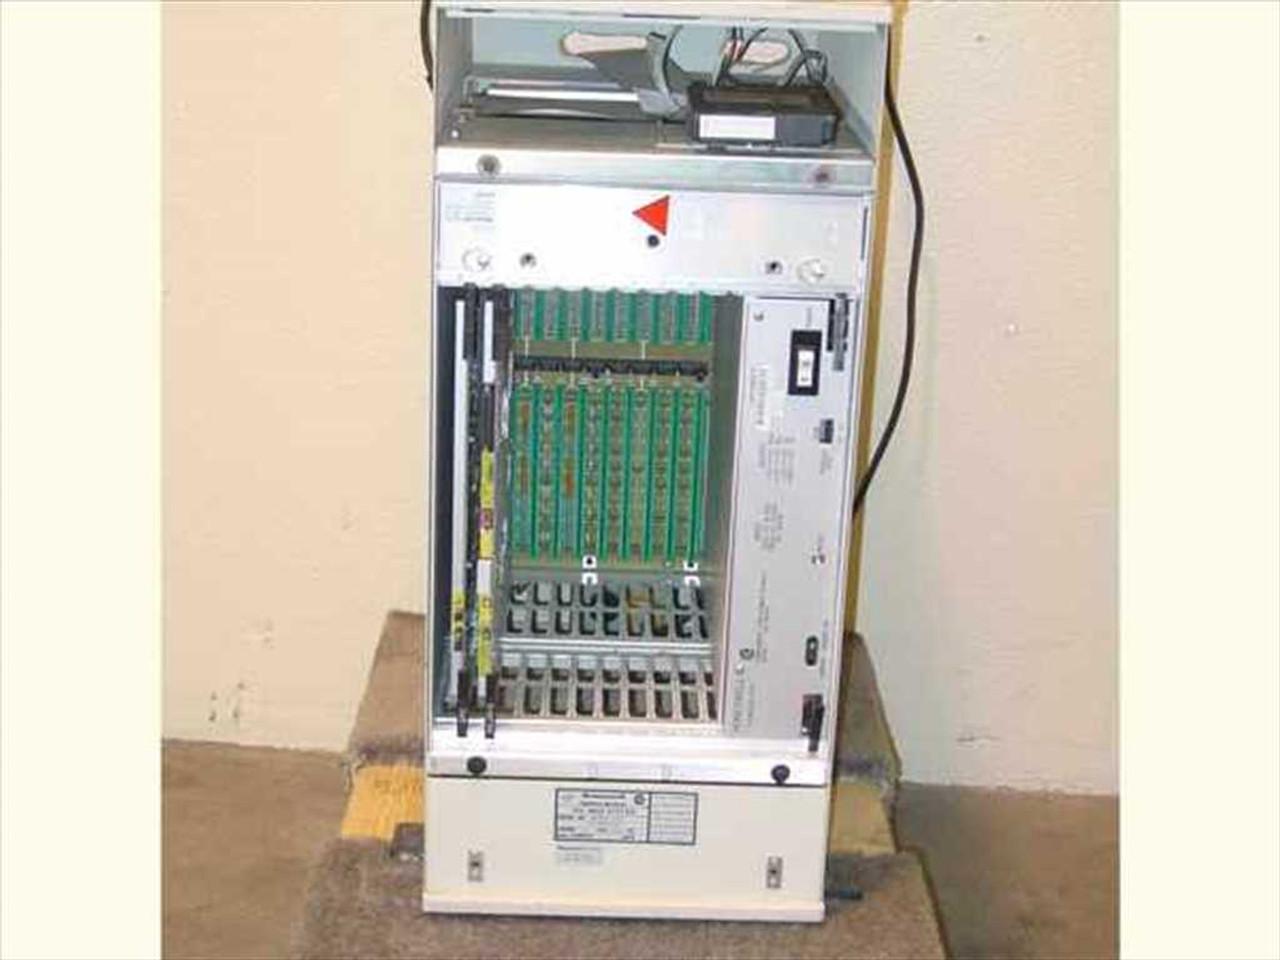 ... Honeywell TDC 3000 Workstation (TDC 3000) ...